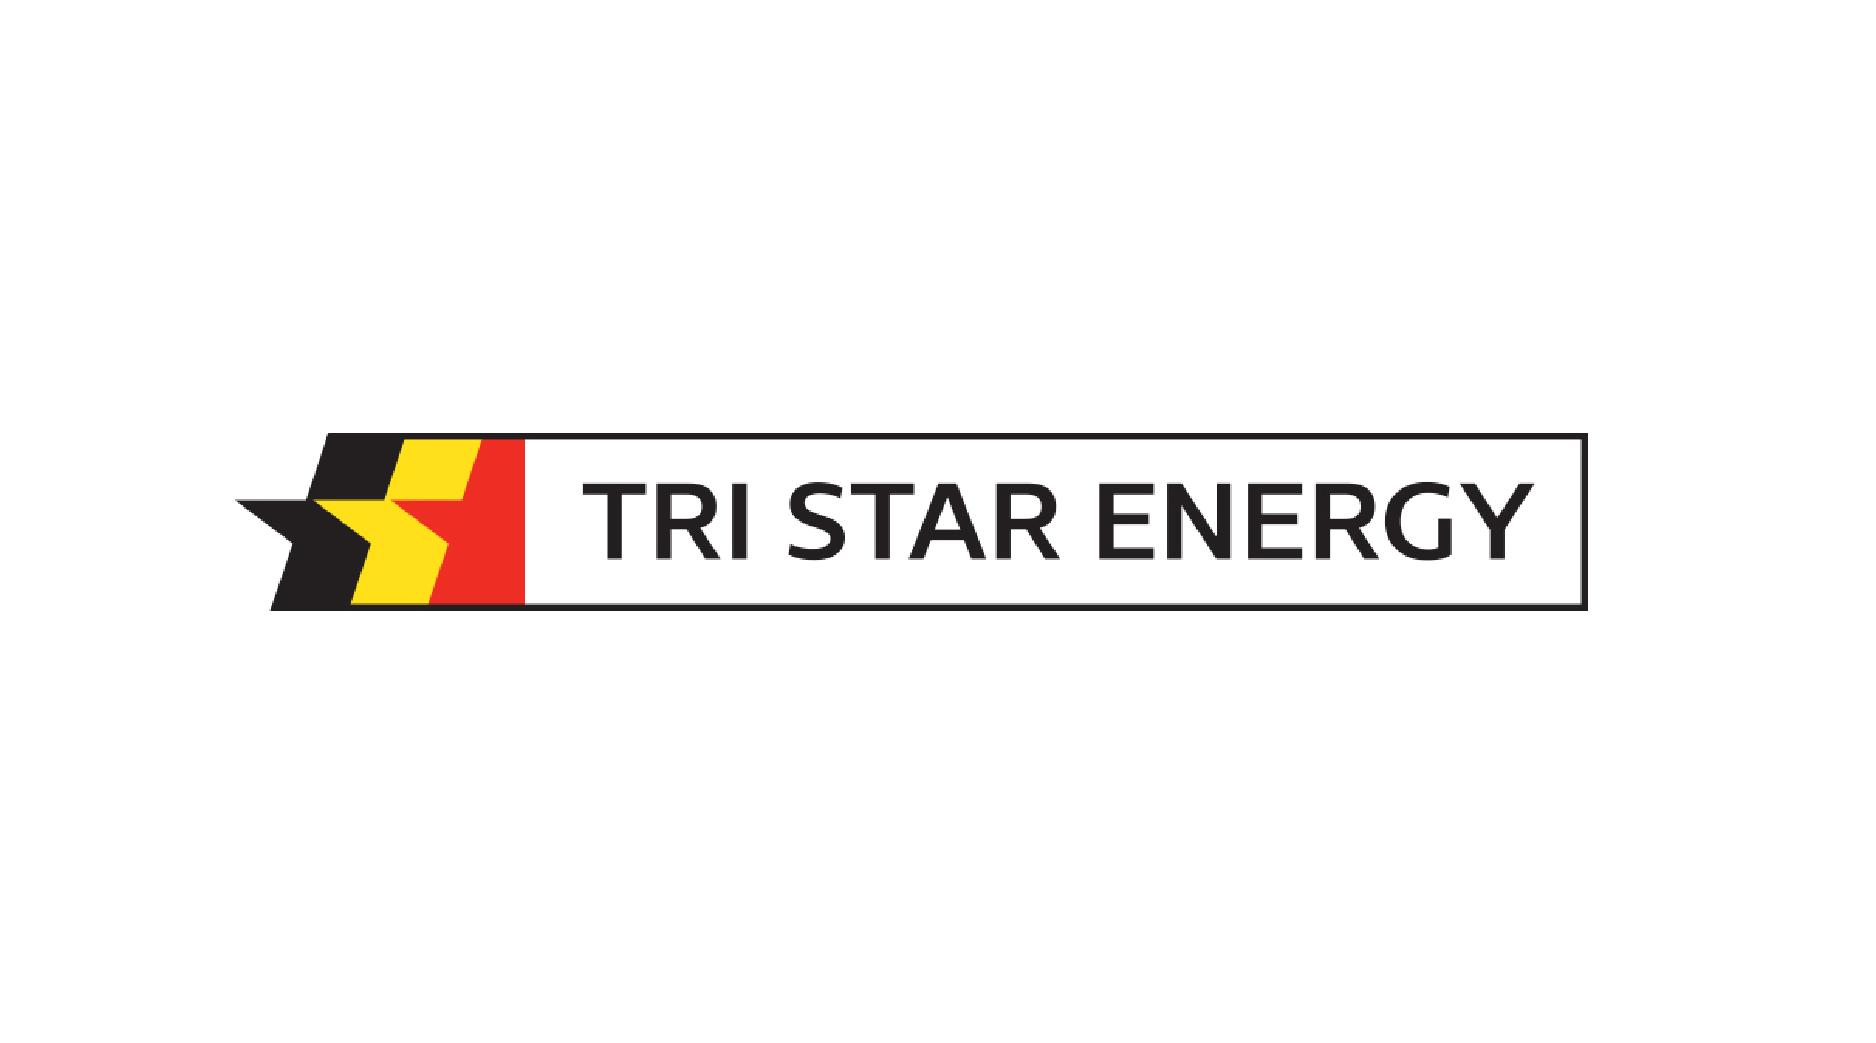 asset-logo-grid_tri-star-energy.png